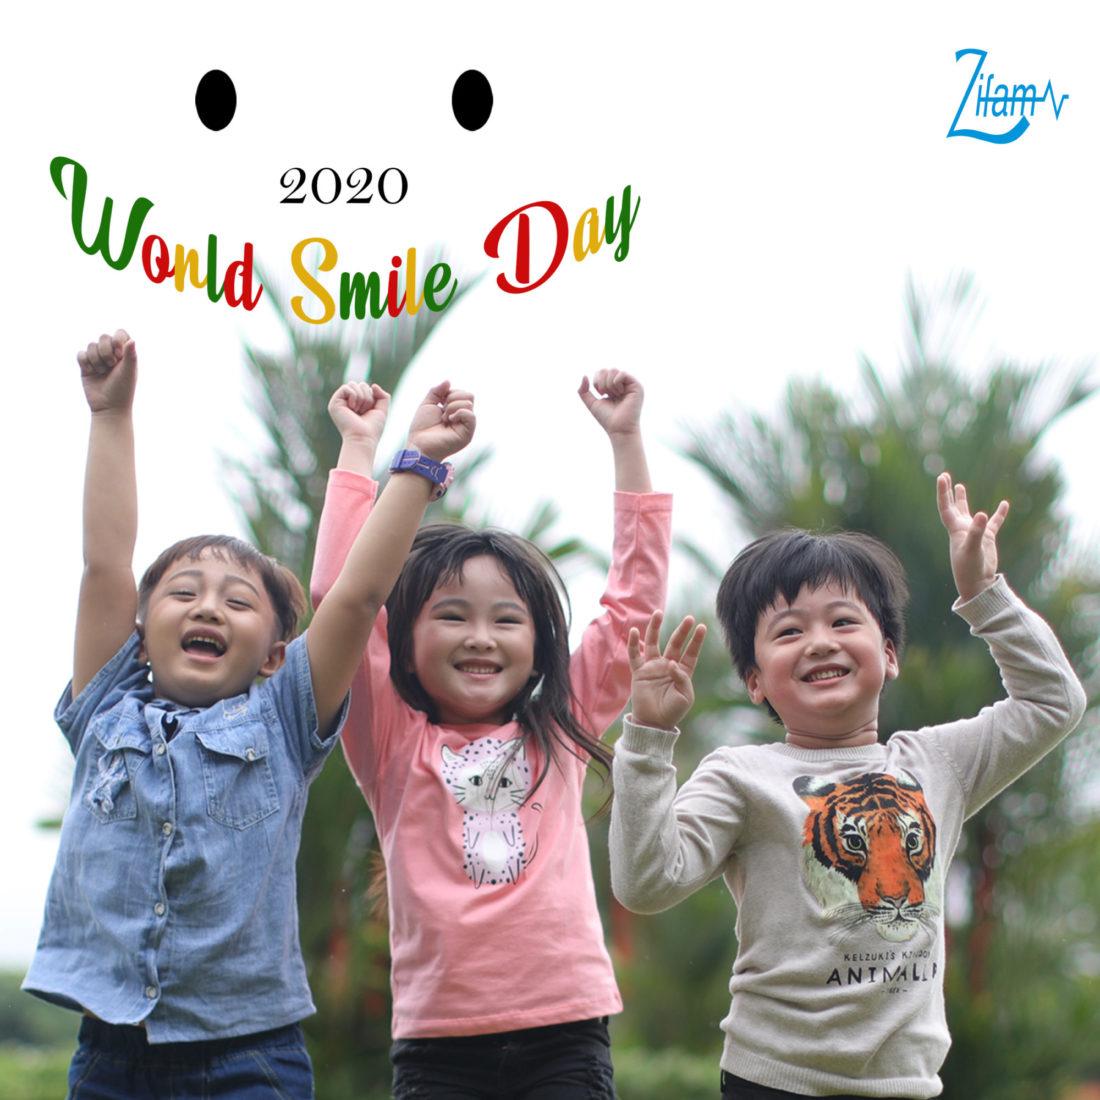 World Smile Day 2020